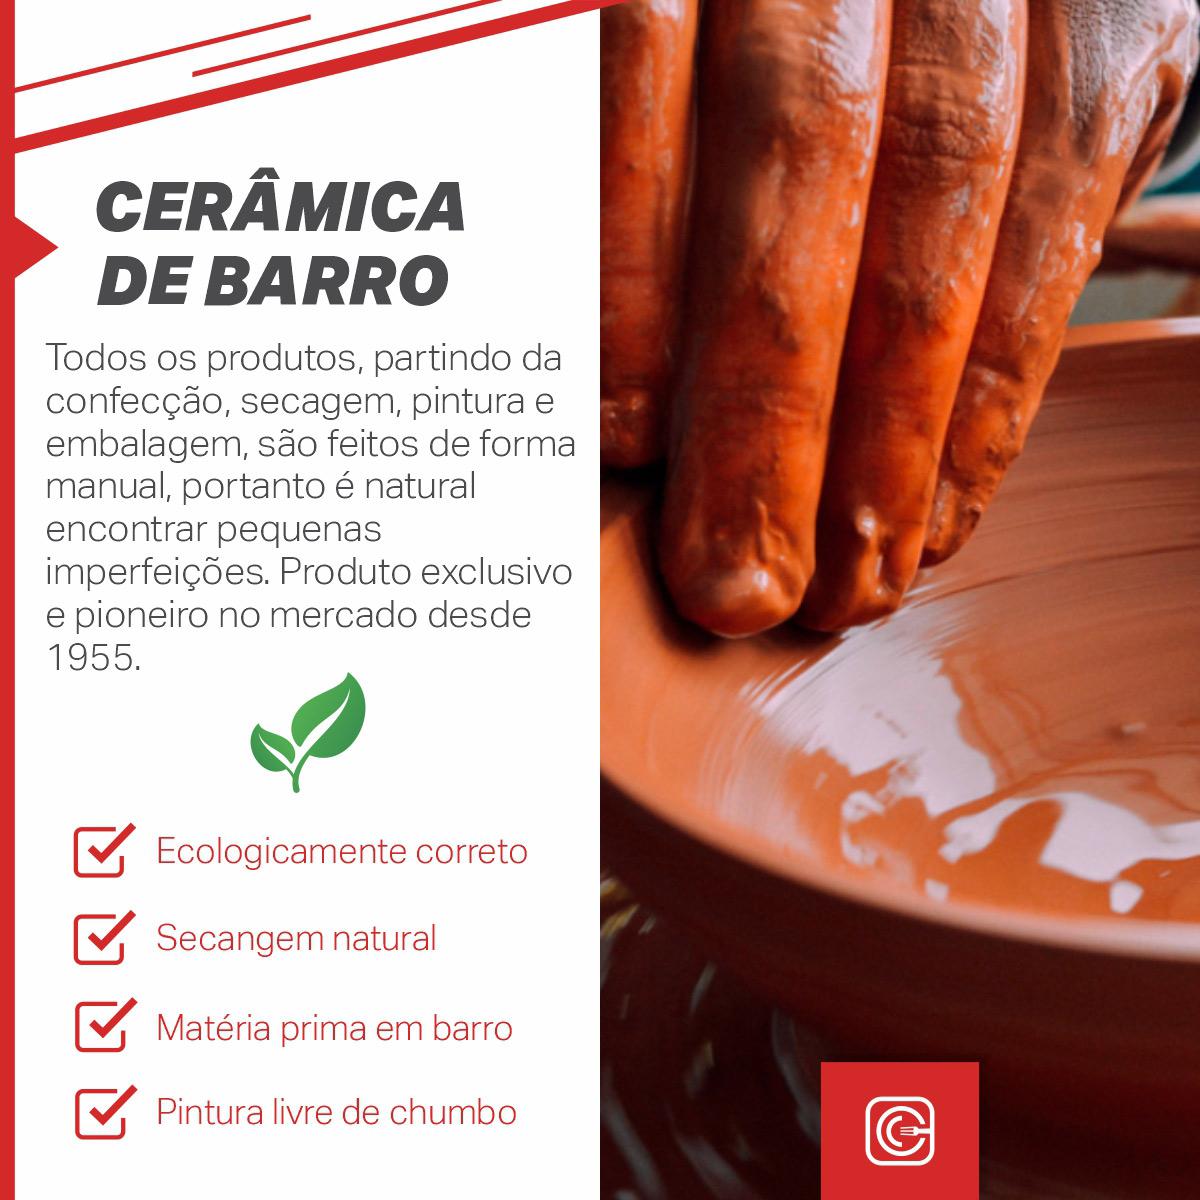 Conjunto para fondue de Cerâmica - nº0 - 5pçs